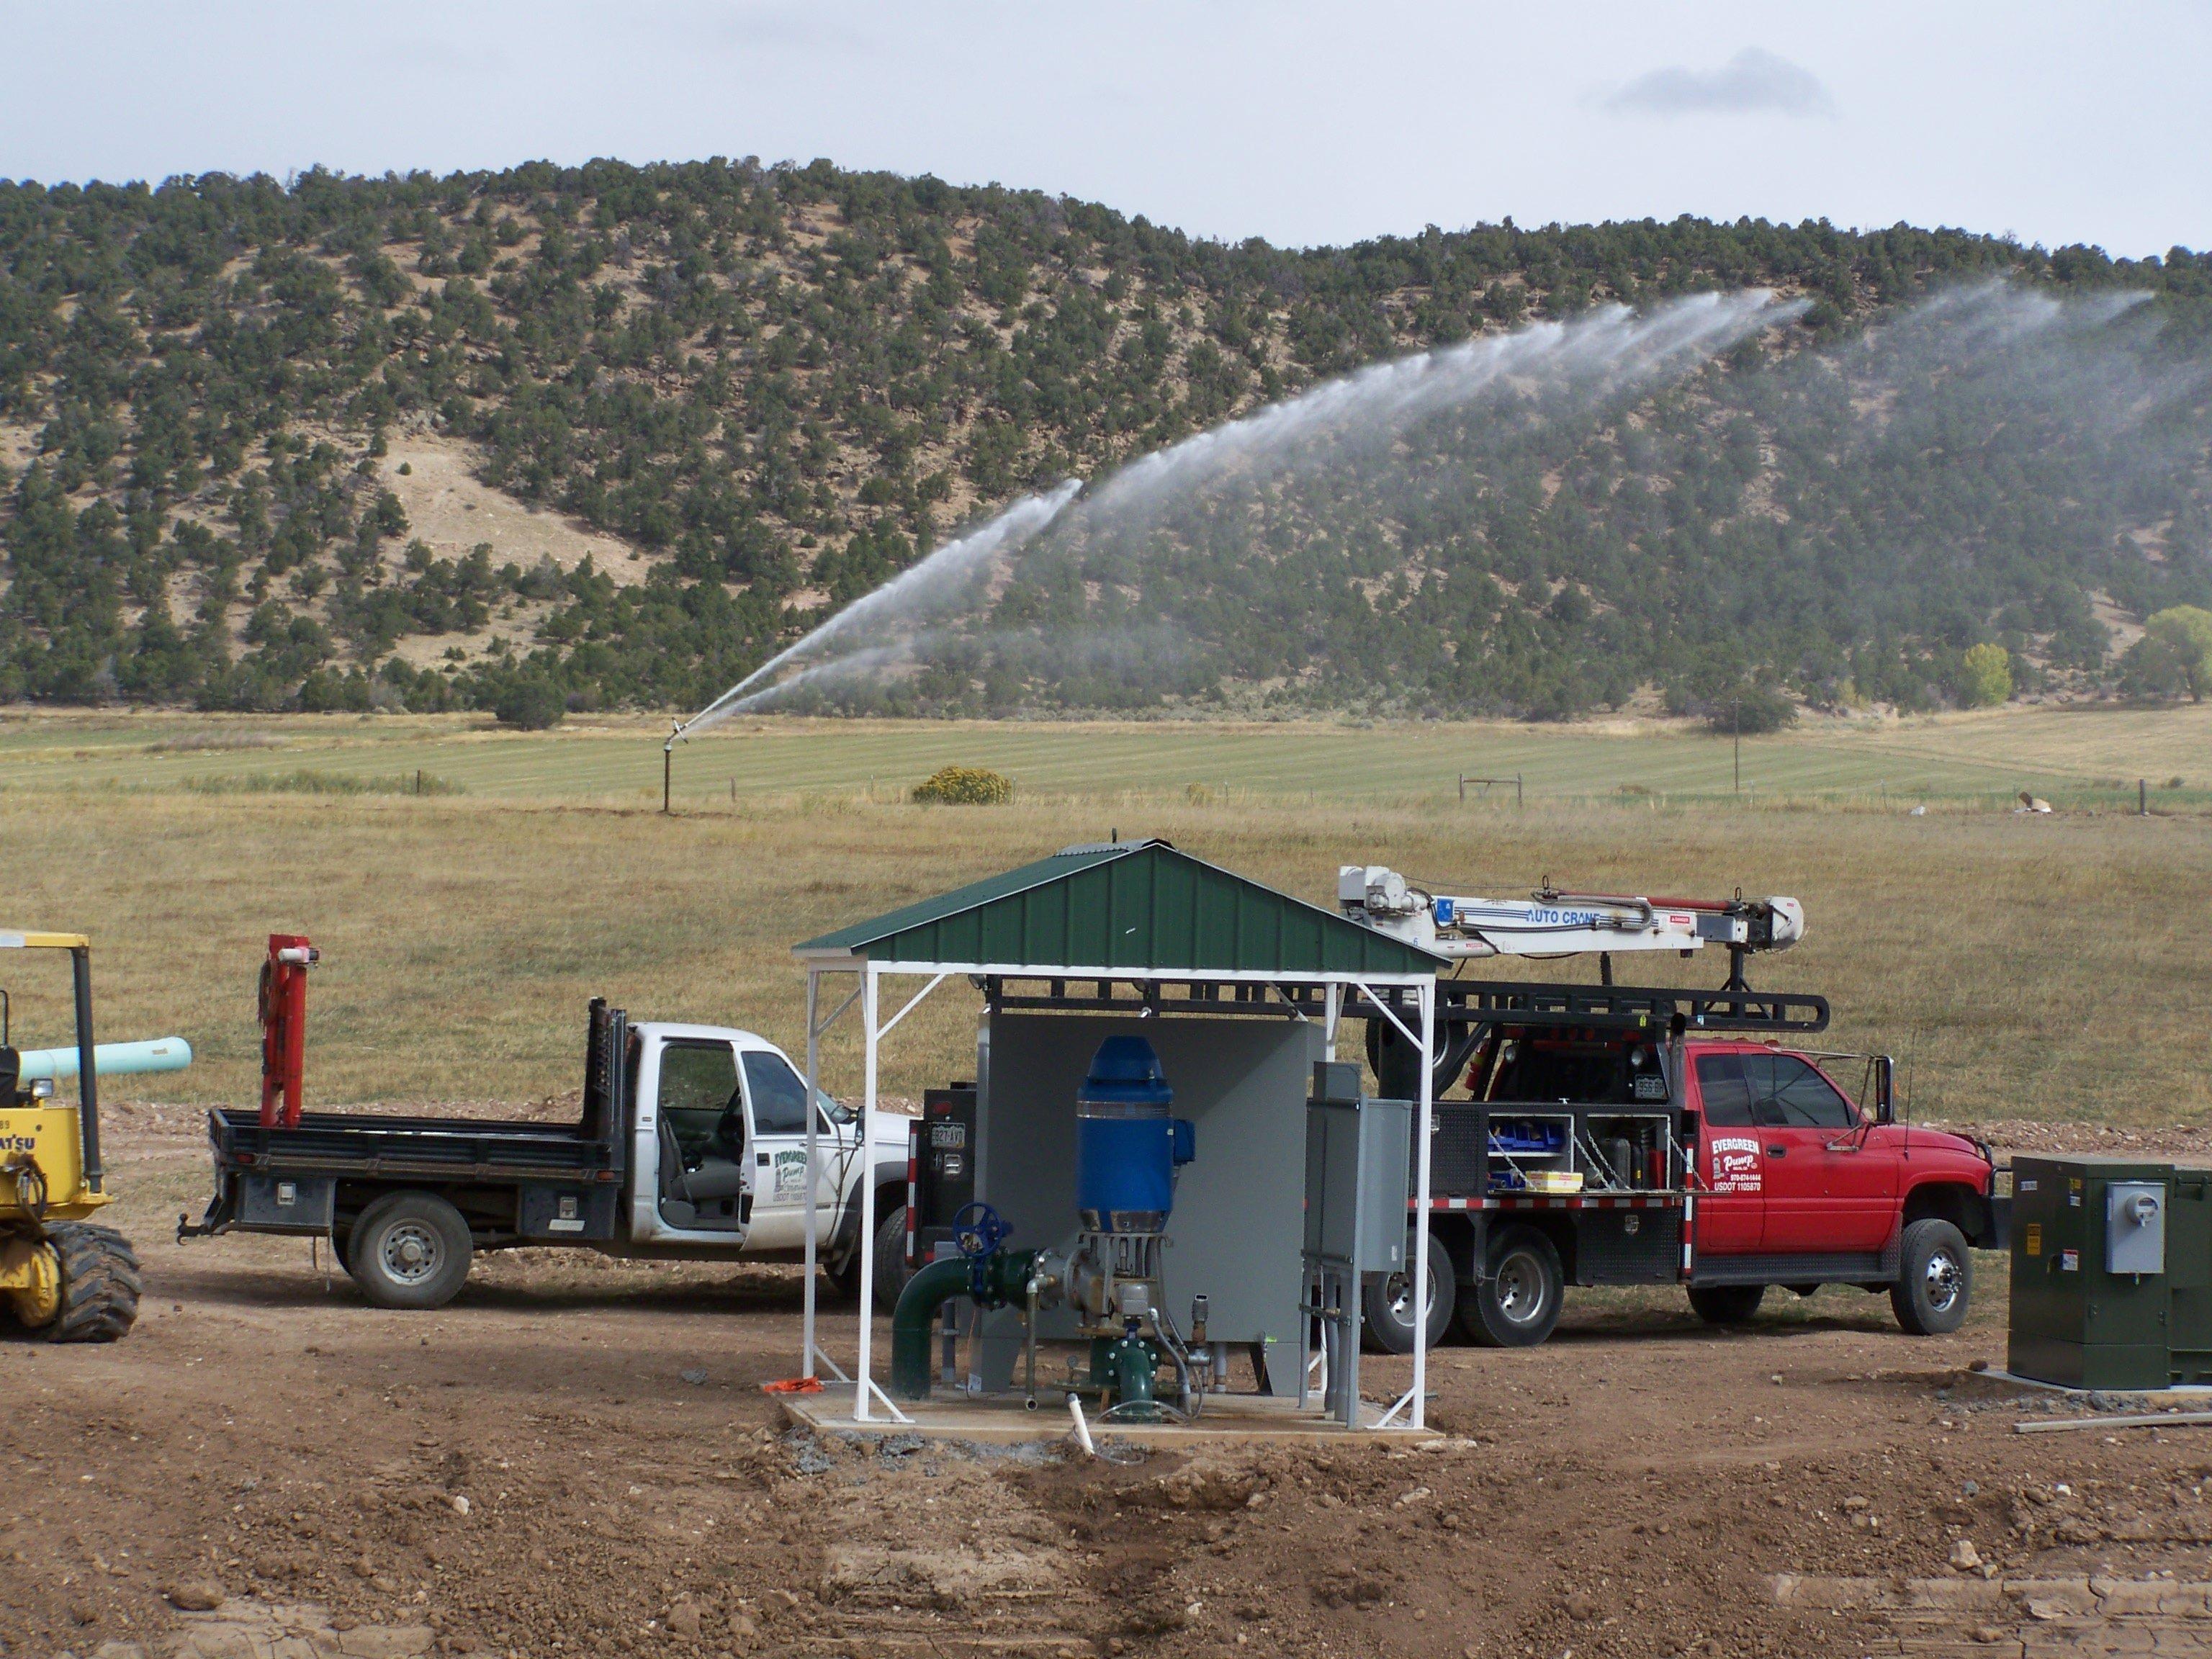 Irrigation pumps on a farm||||